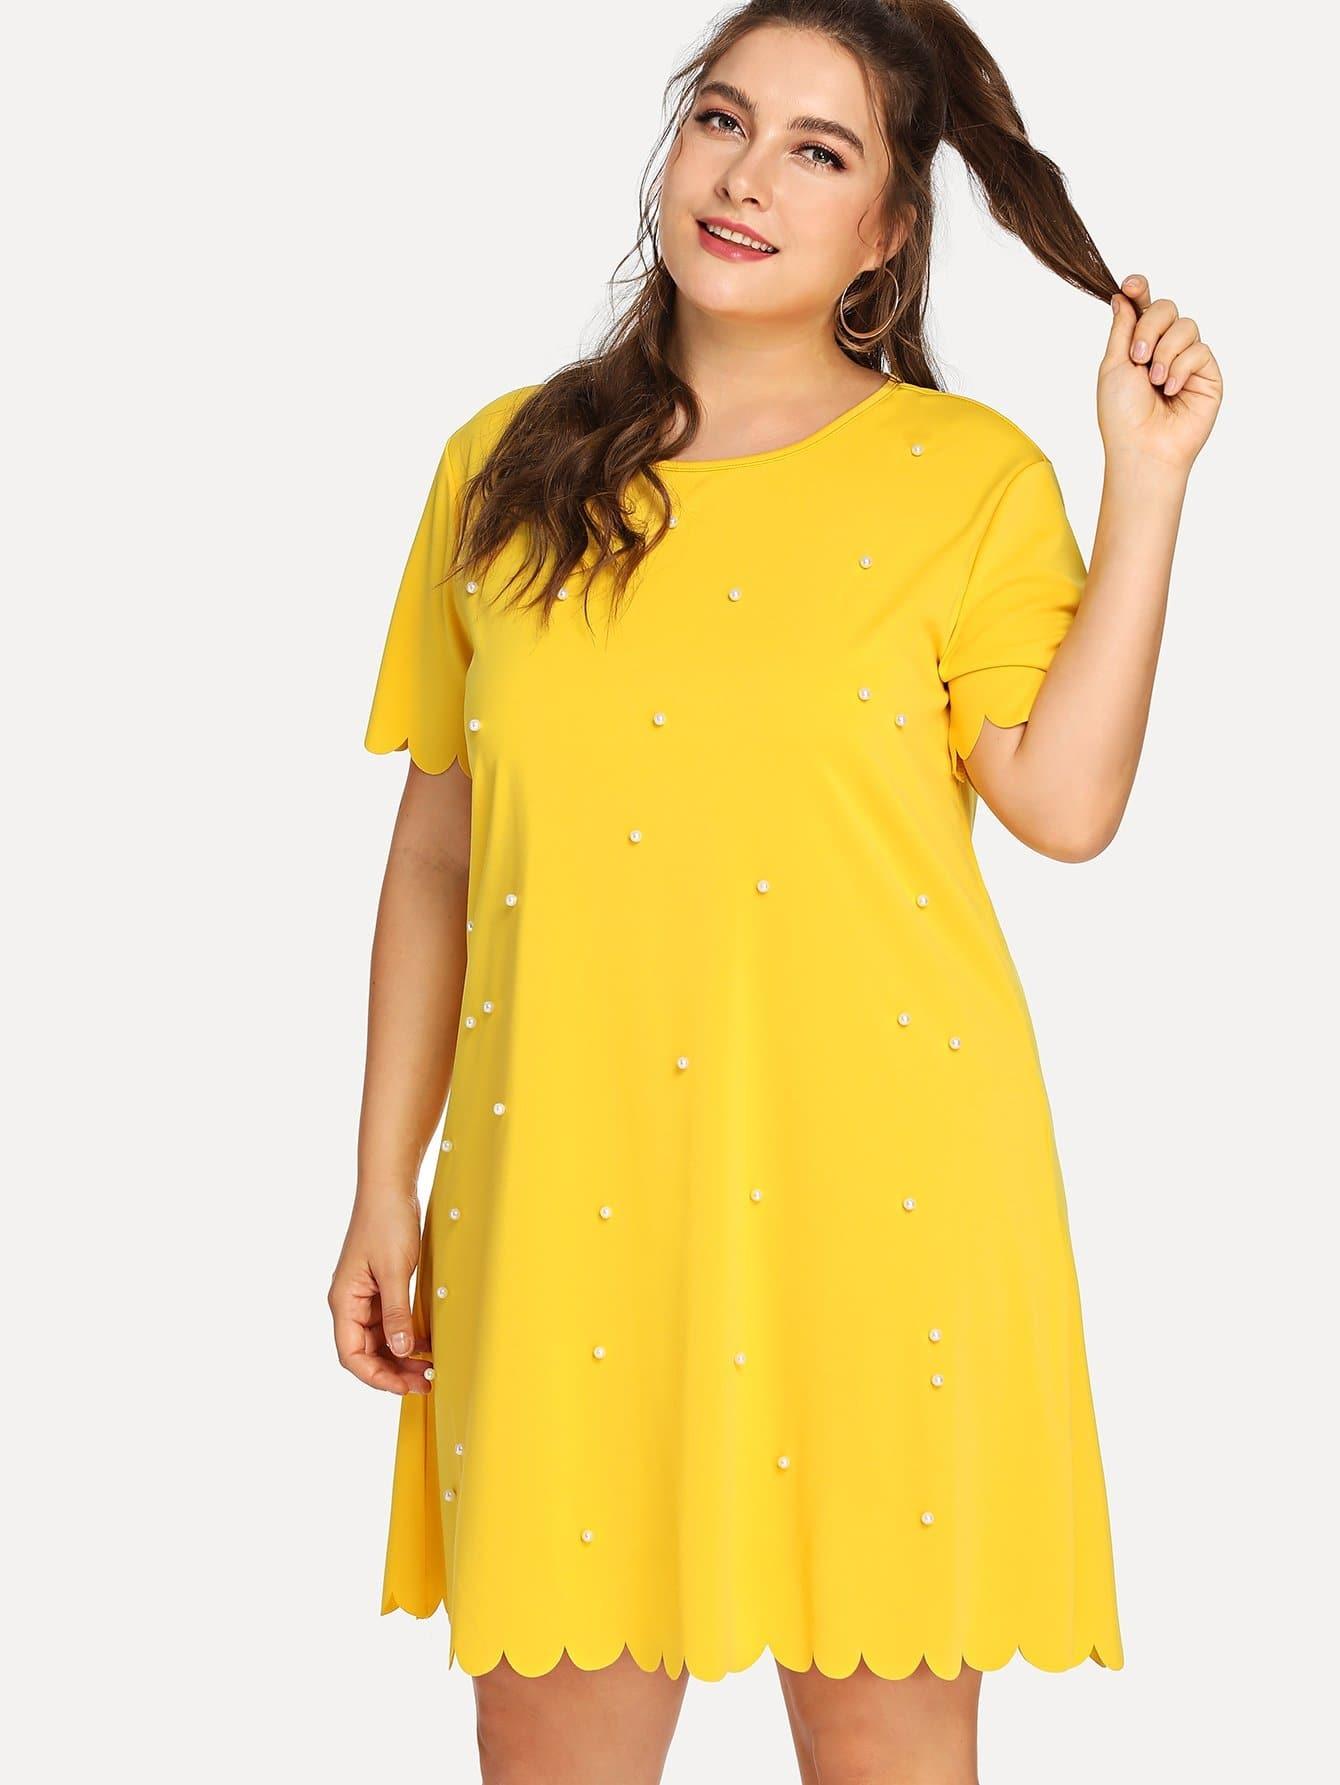 Beaded Scallop Trim Dress